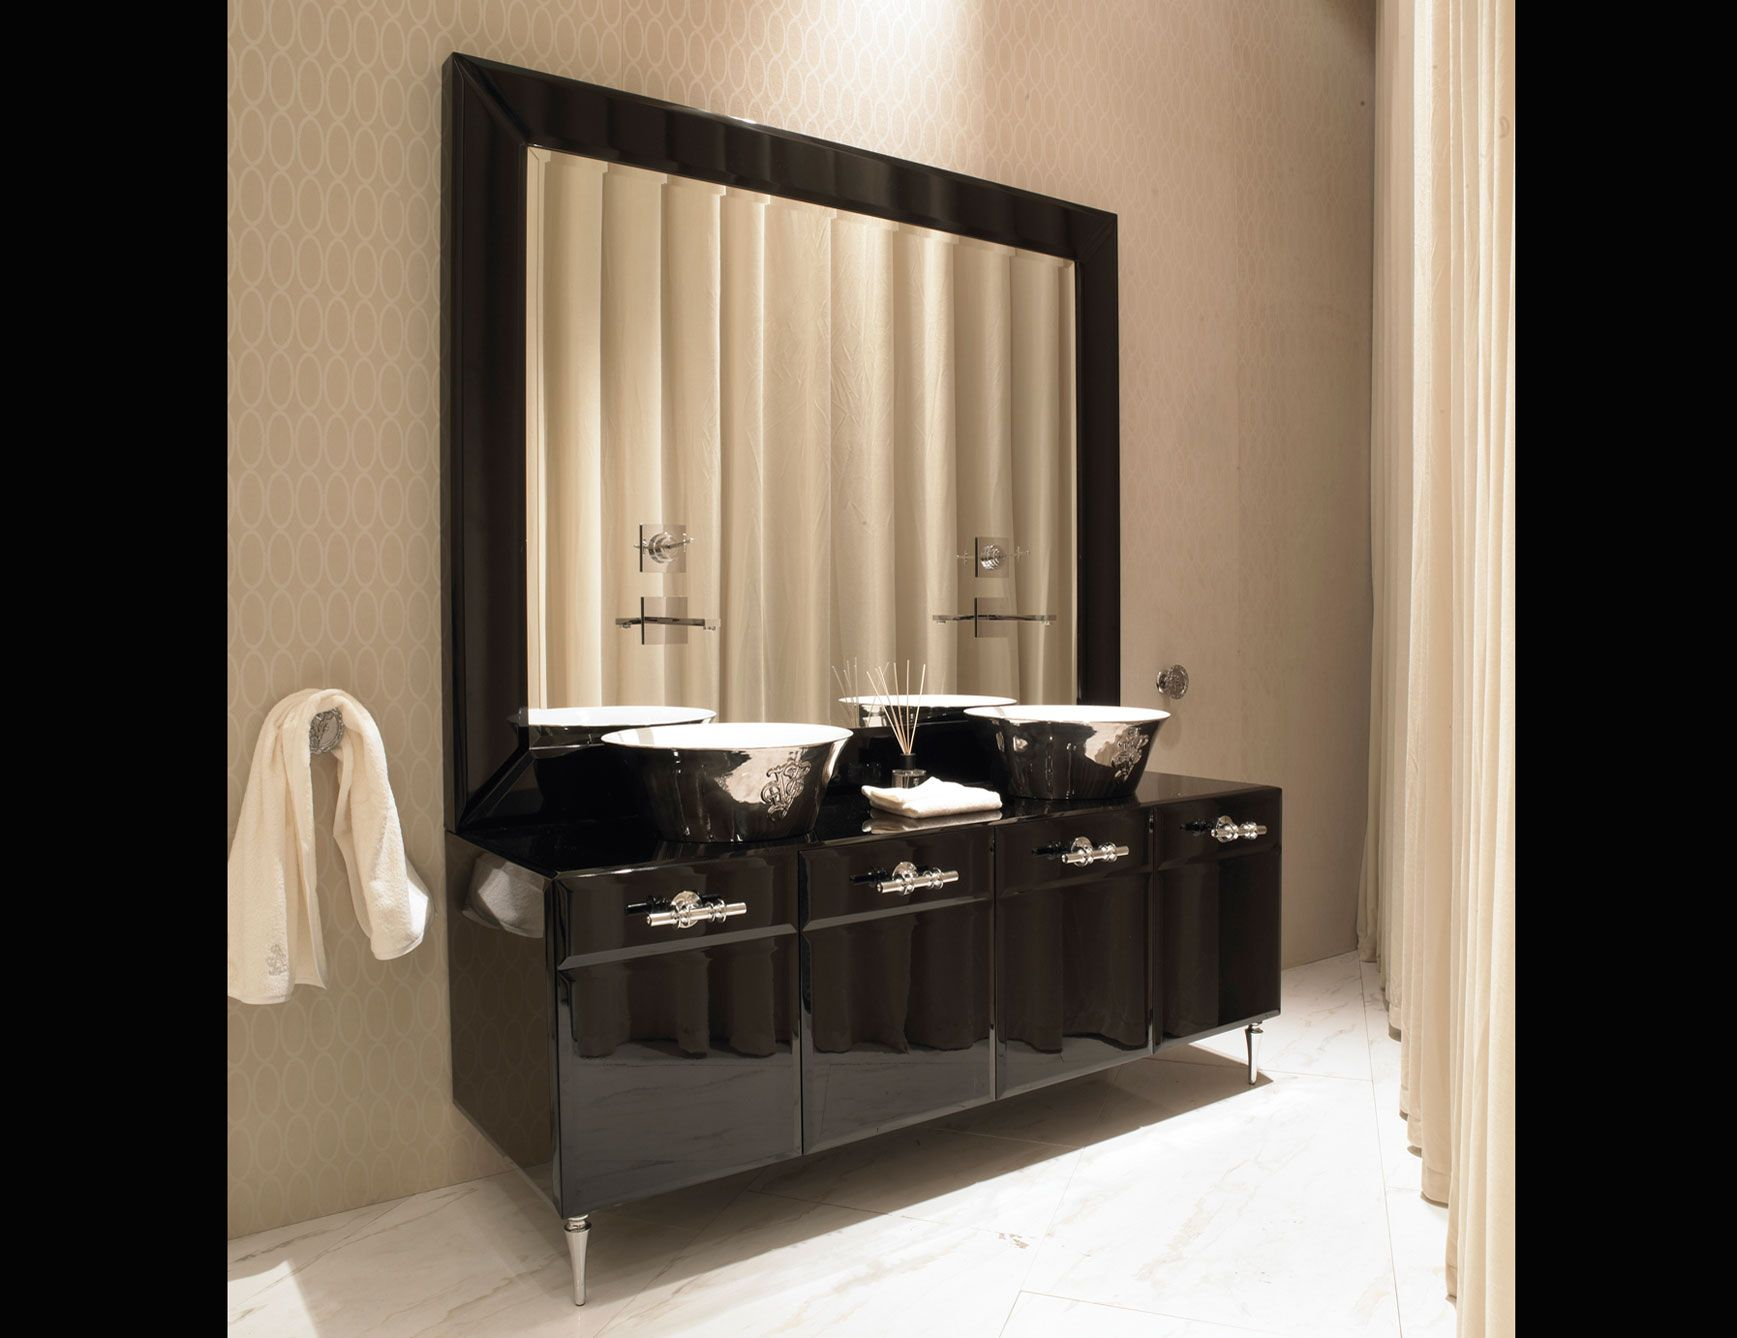 Bathroom vanity and mirror combo ideas pinterest ideas